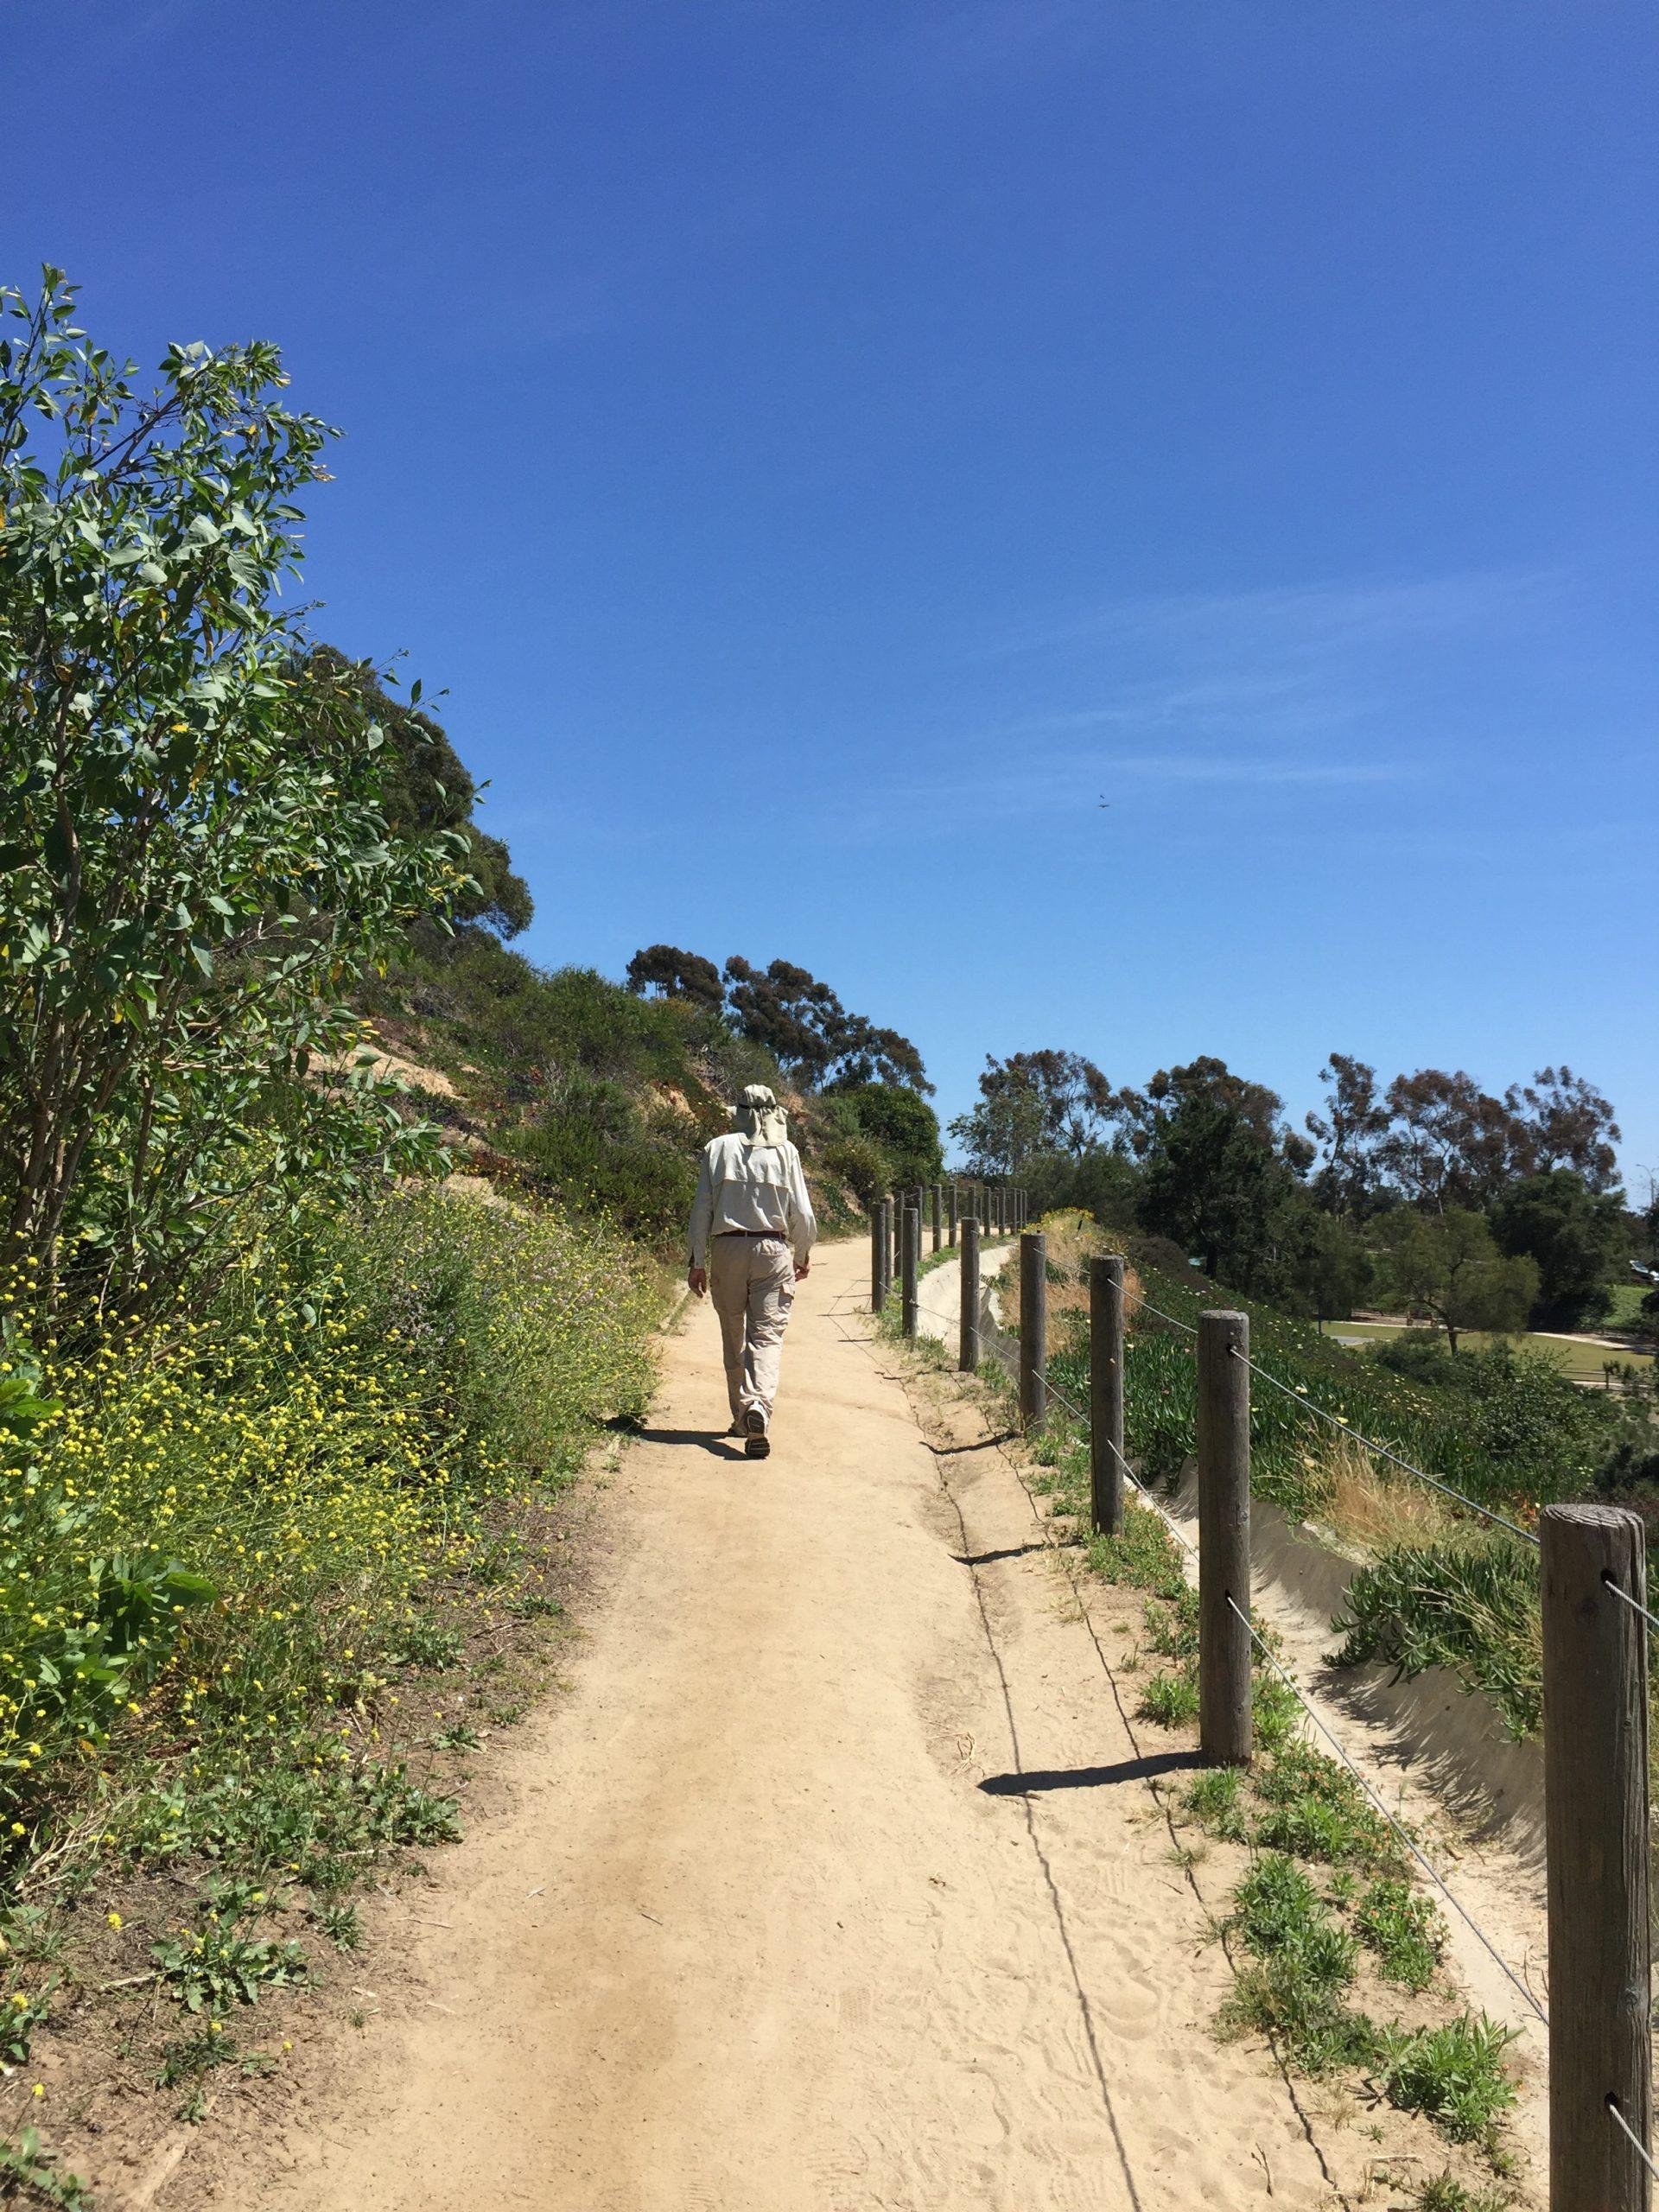 A short walk to help the brain